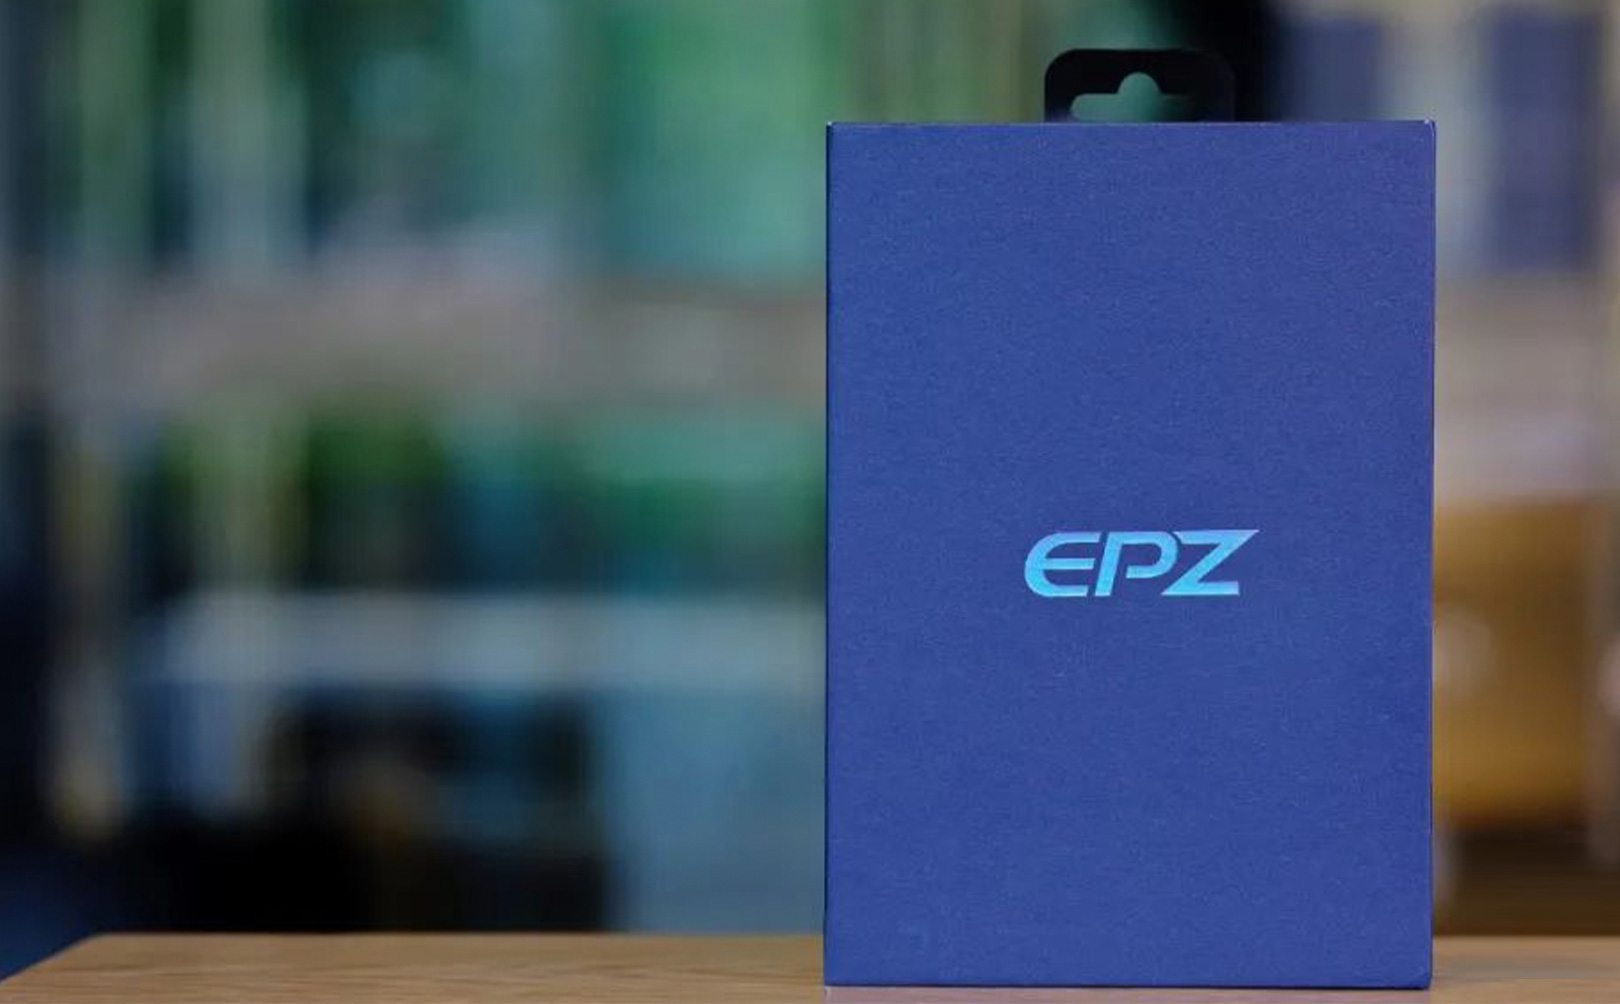 epz320入耳式Hifi耳机EPZ耳机